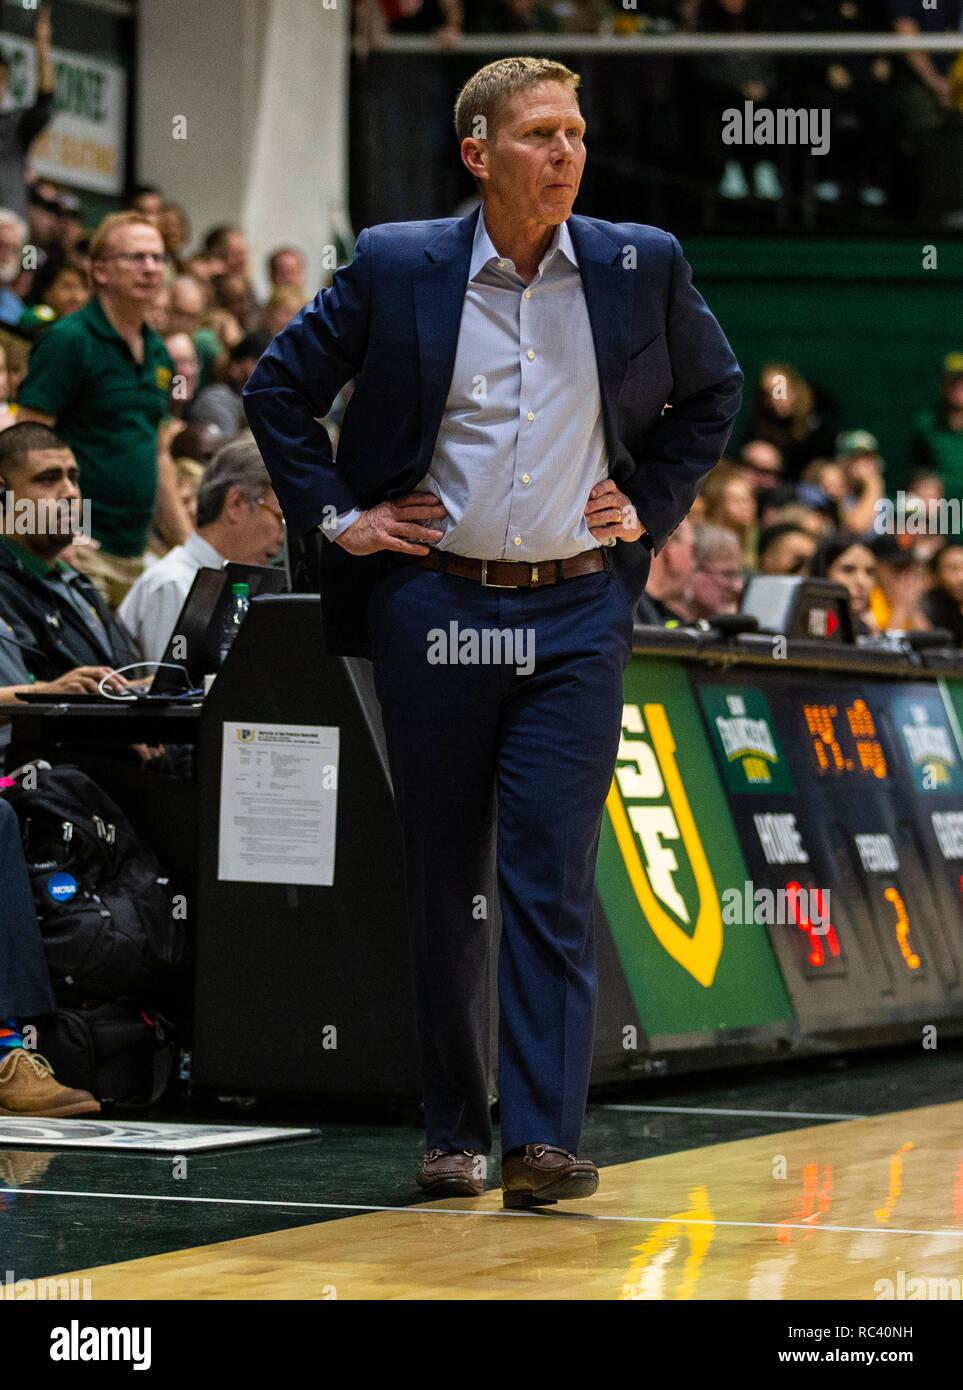 Nick Sparks datant entraîneurBarbe datant du site du Royaume-Uni